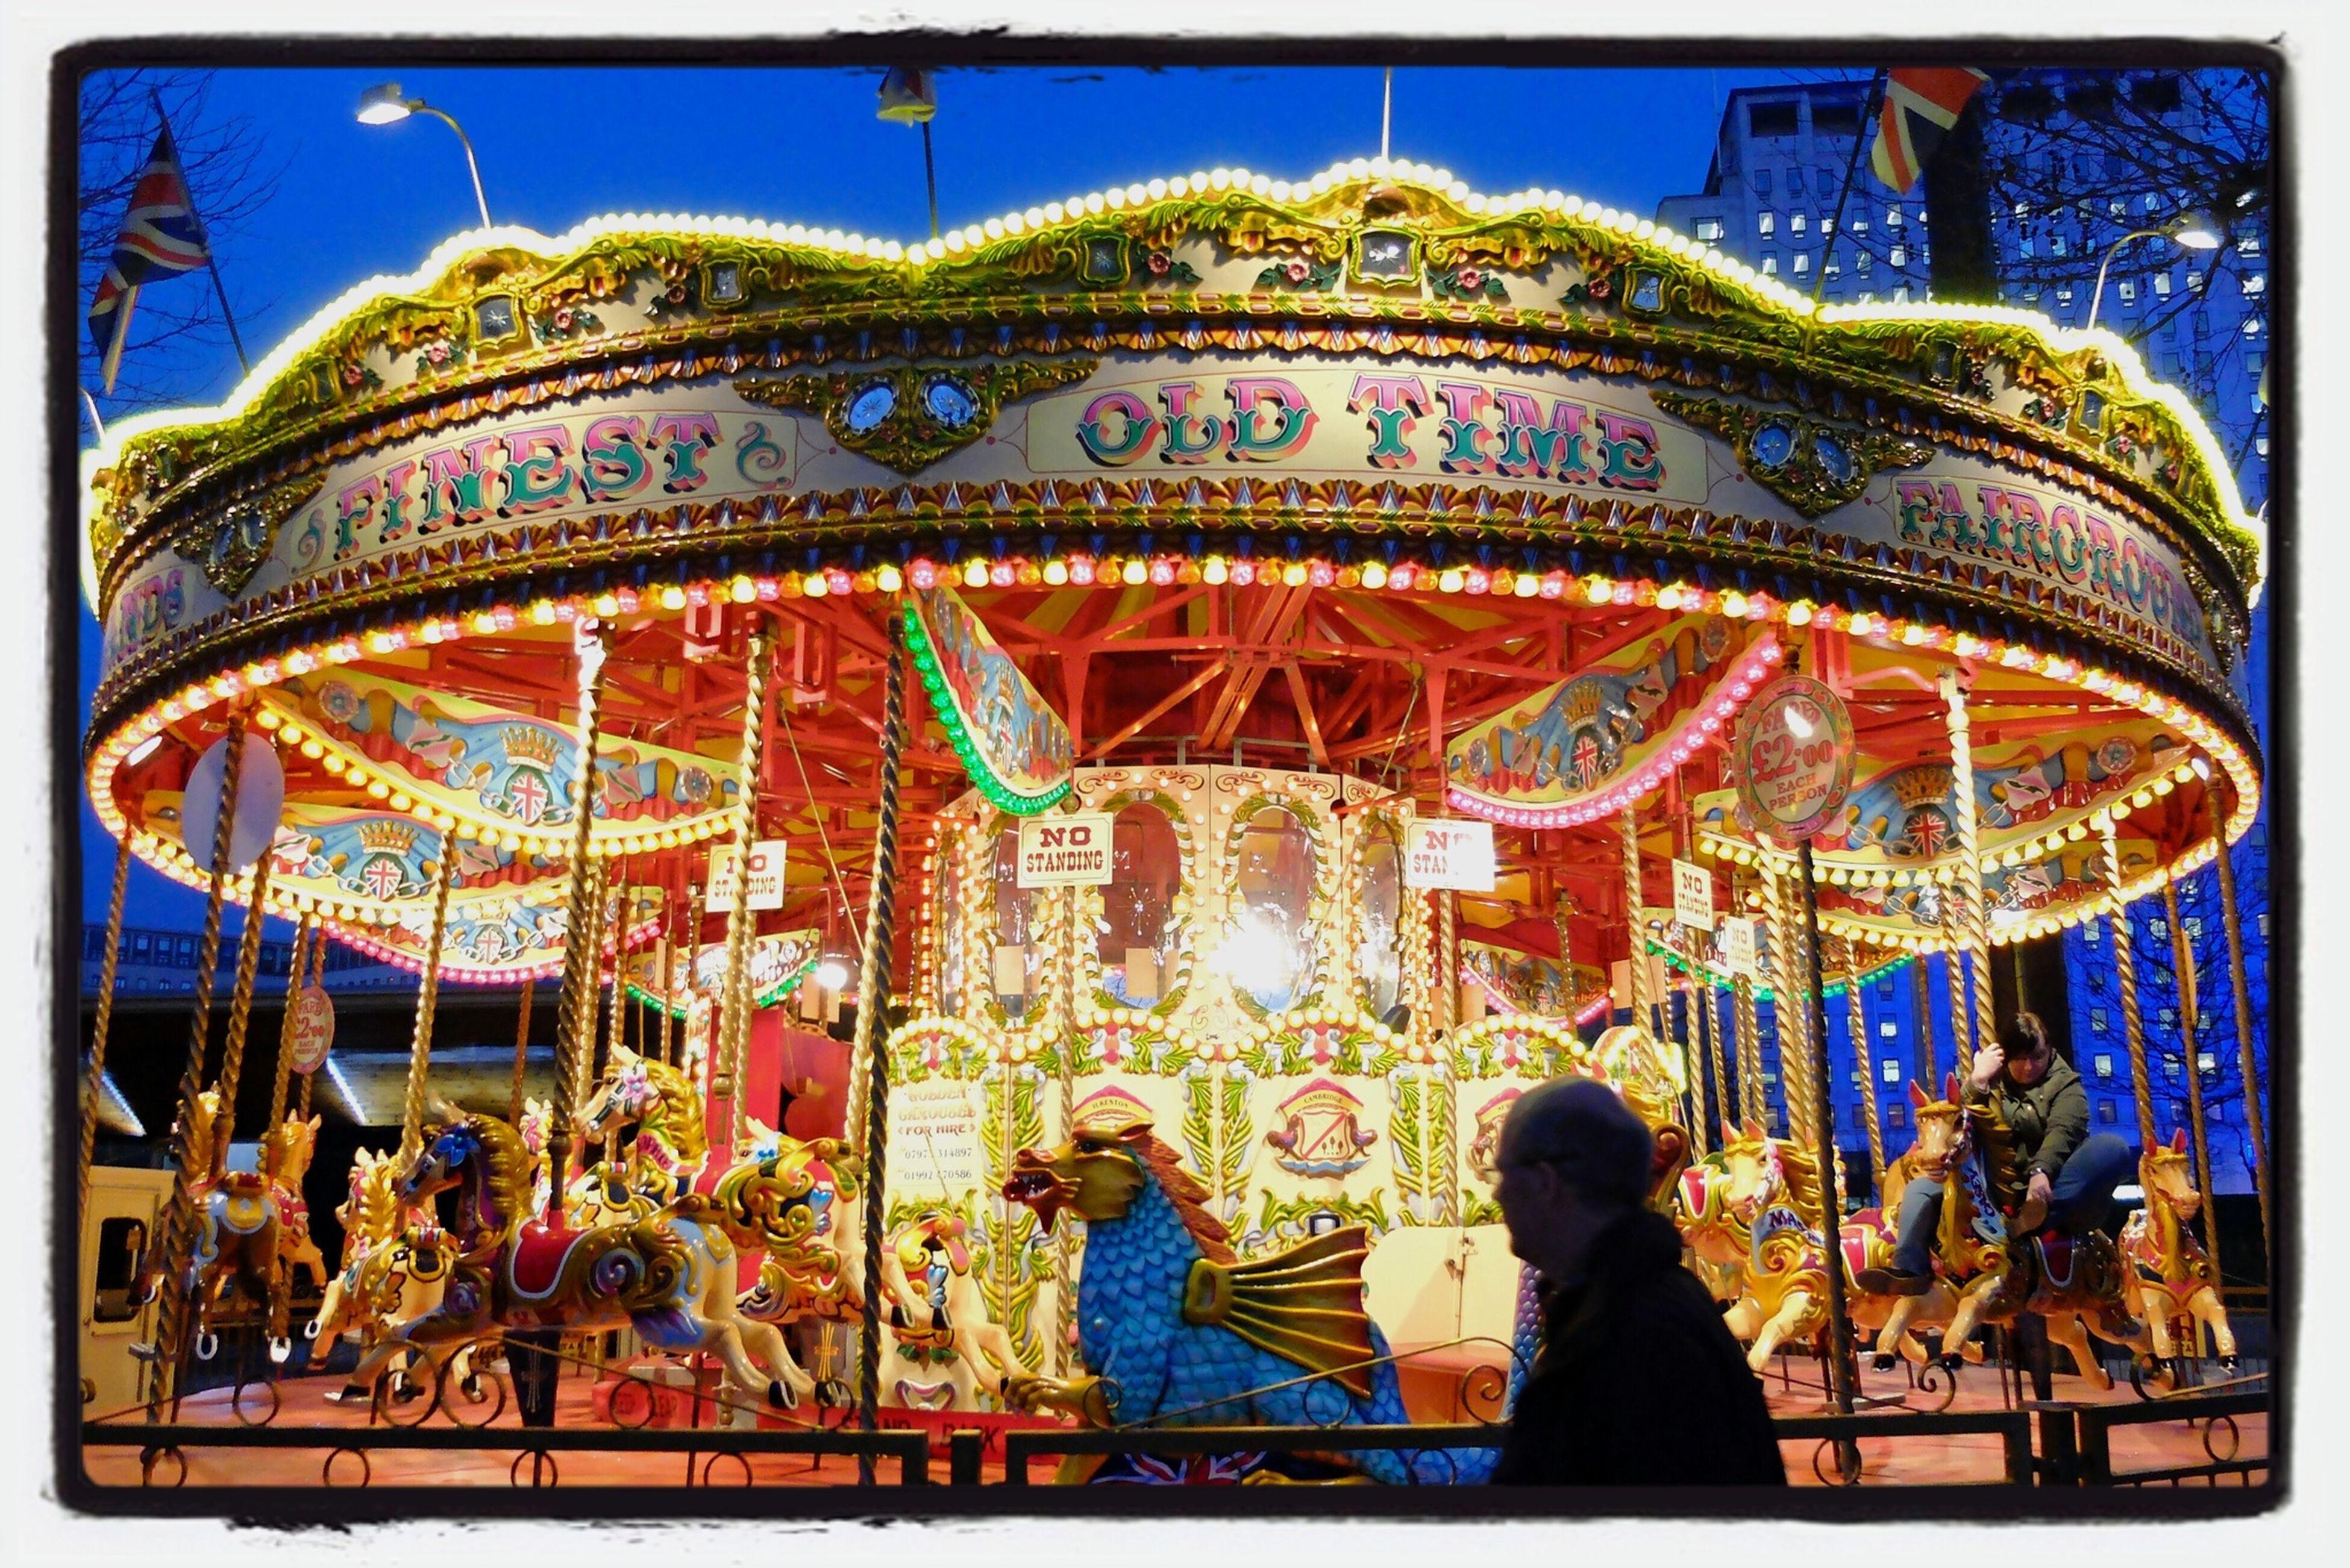 Carousel on the South Bank, London. London Taking Photos